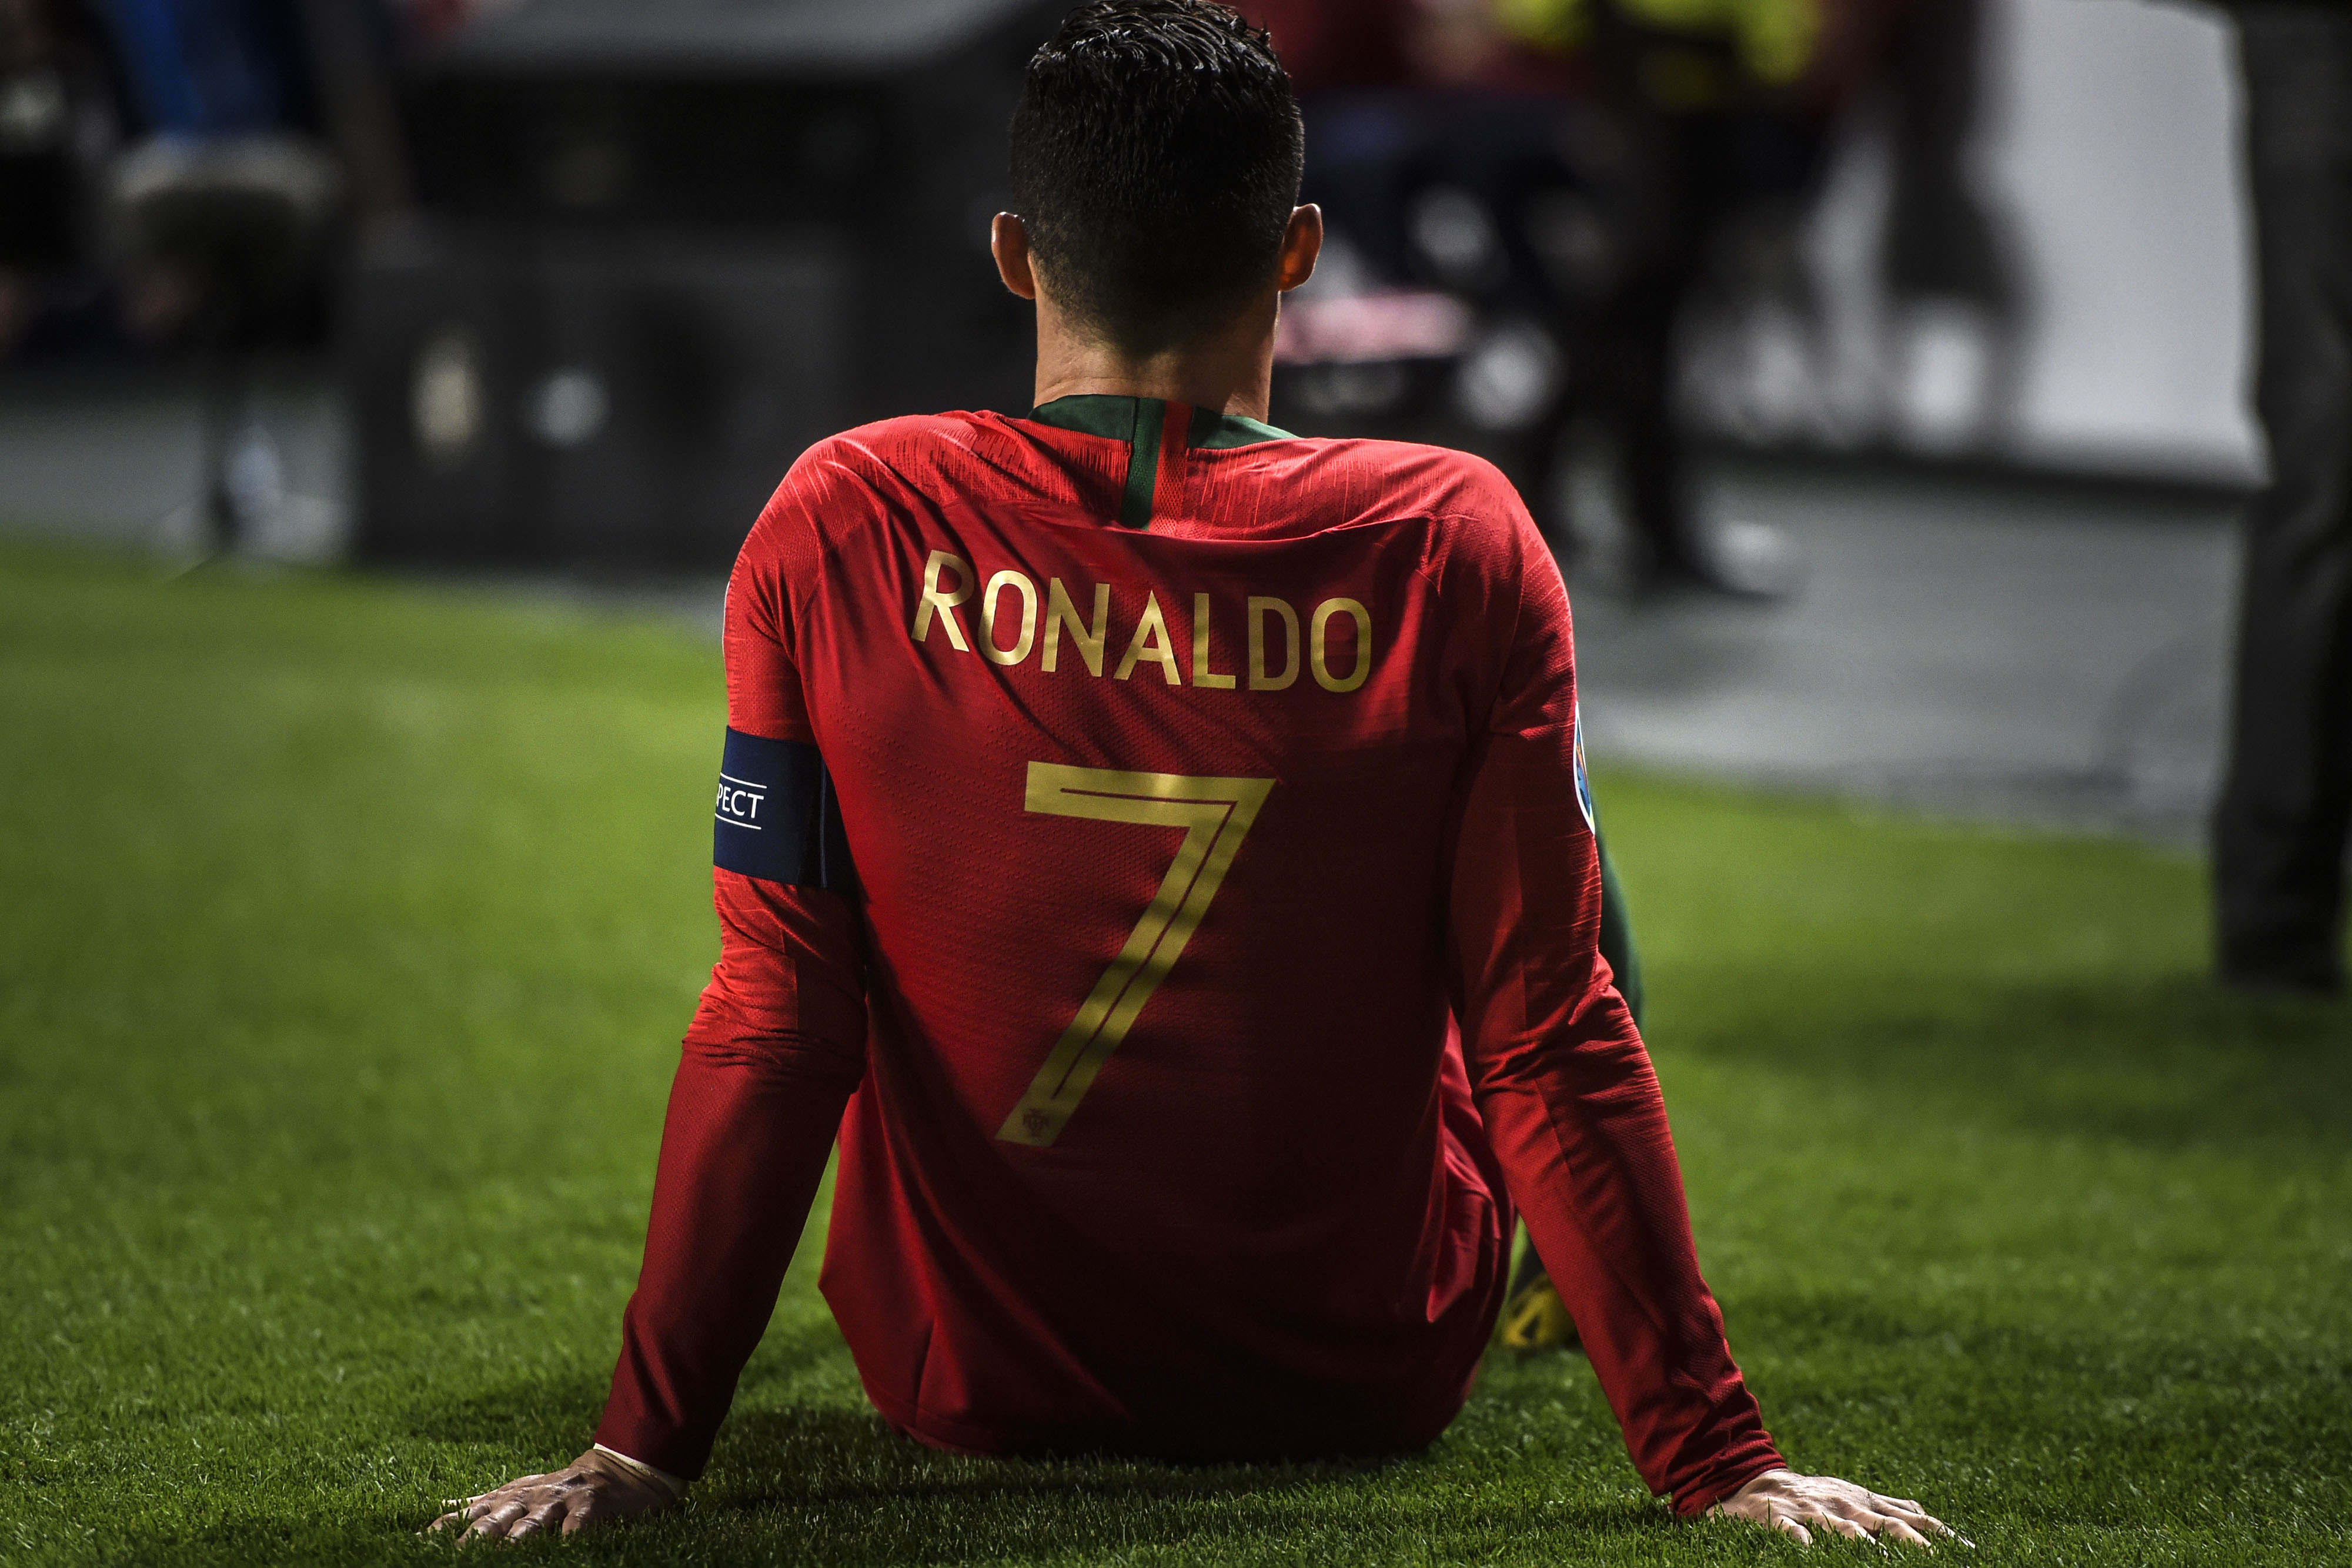 Cristiano Ronaldo se lesionó durante el partido Portugal vs Serbia. (Foto Prensa Libre: AFP)